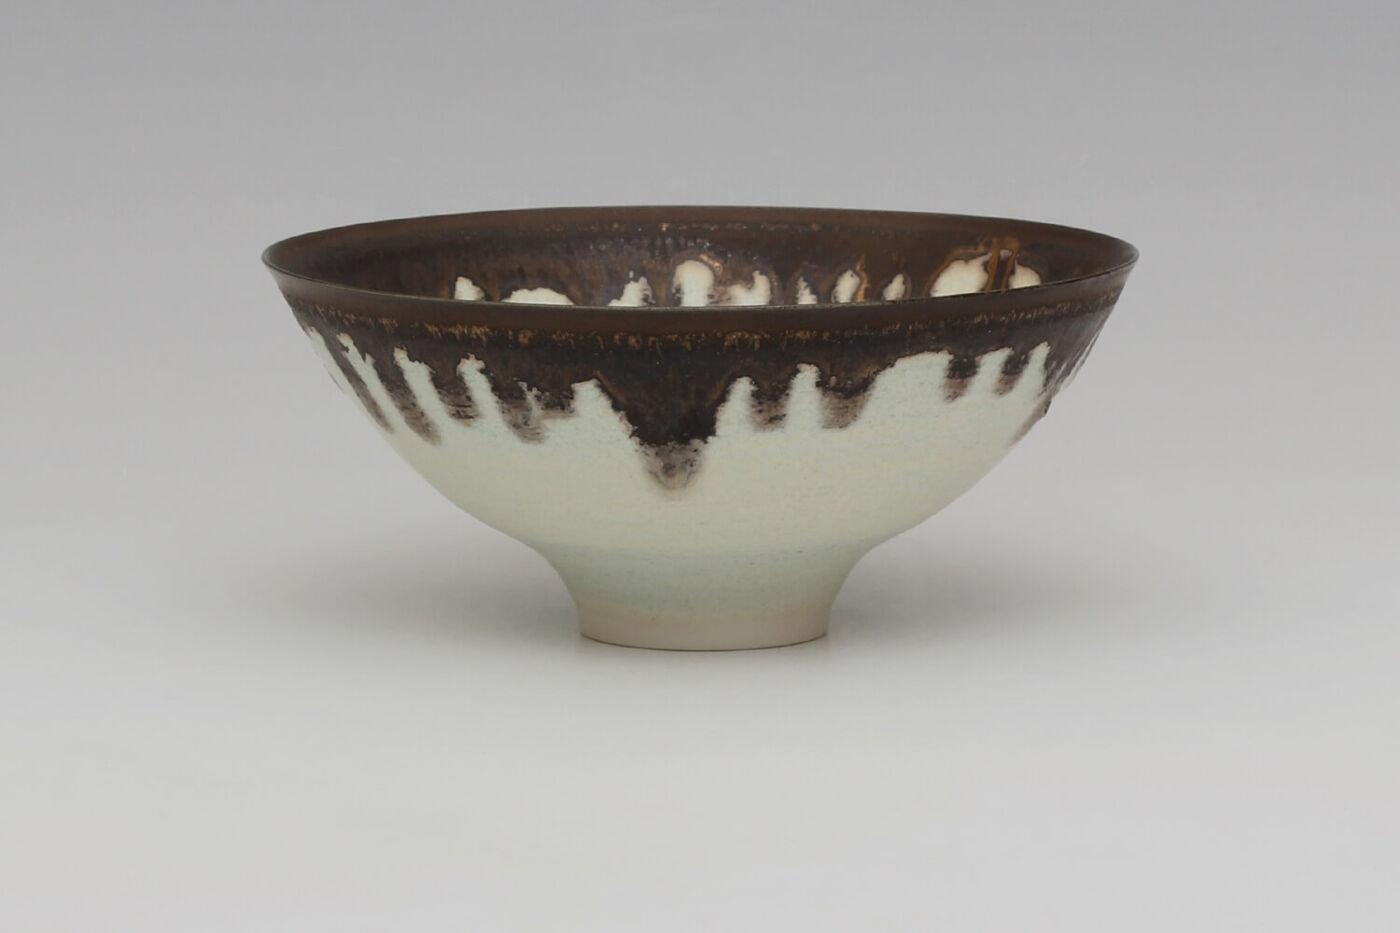 Peter Wills Ceramic Pale Blue Green Porcelain Bowl 205